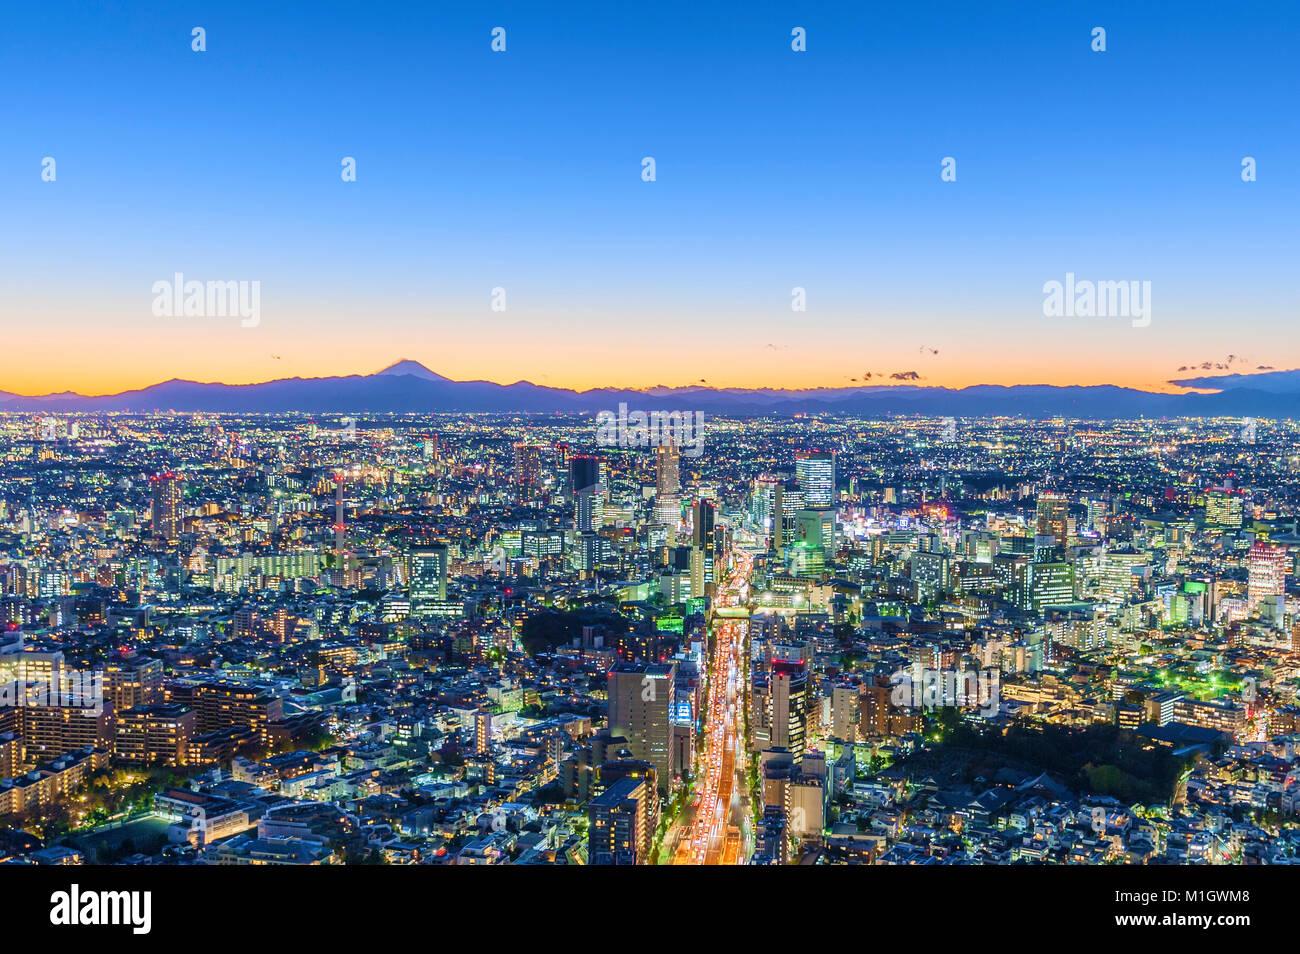 Paisaje Urbano Vista aérea Tokio JAPÓN Foto de stock